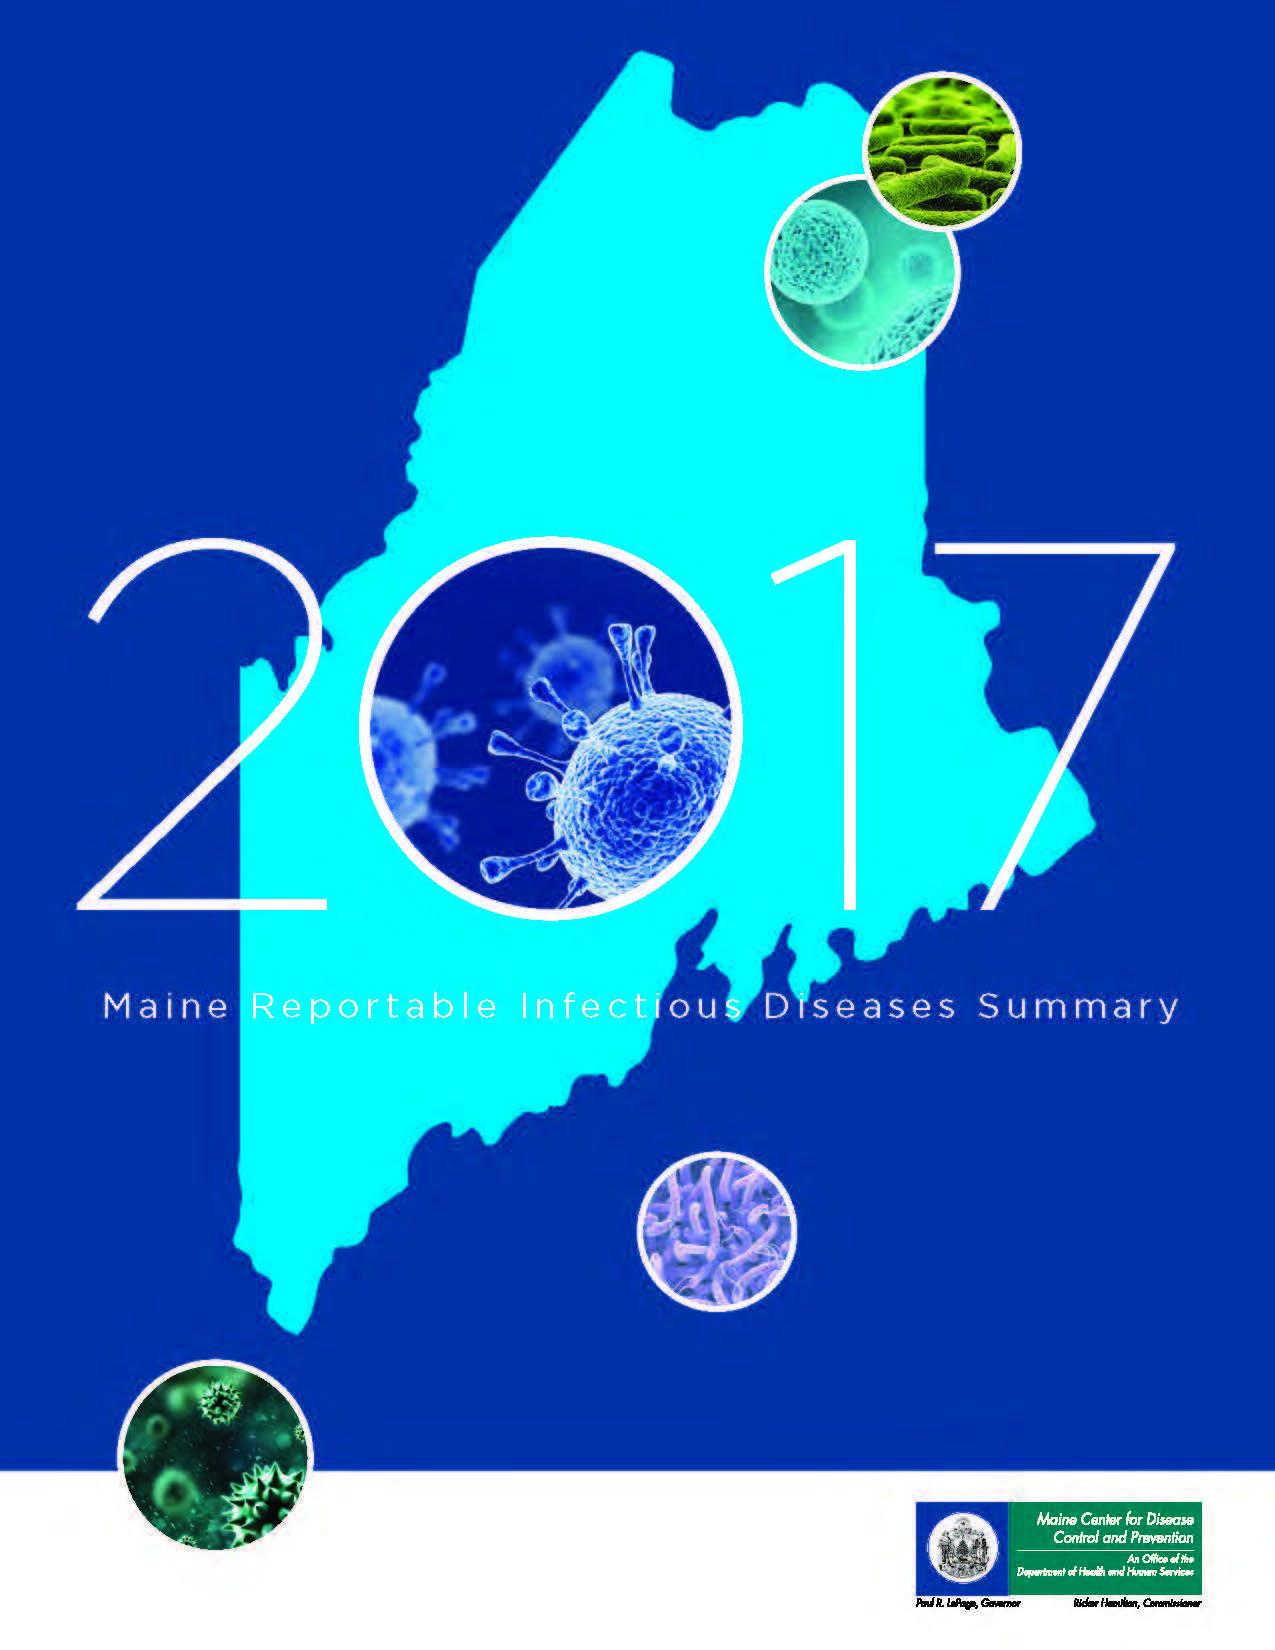 2017 Infectious Disease Annual Summary